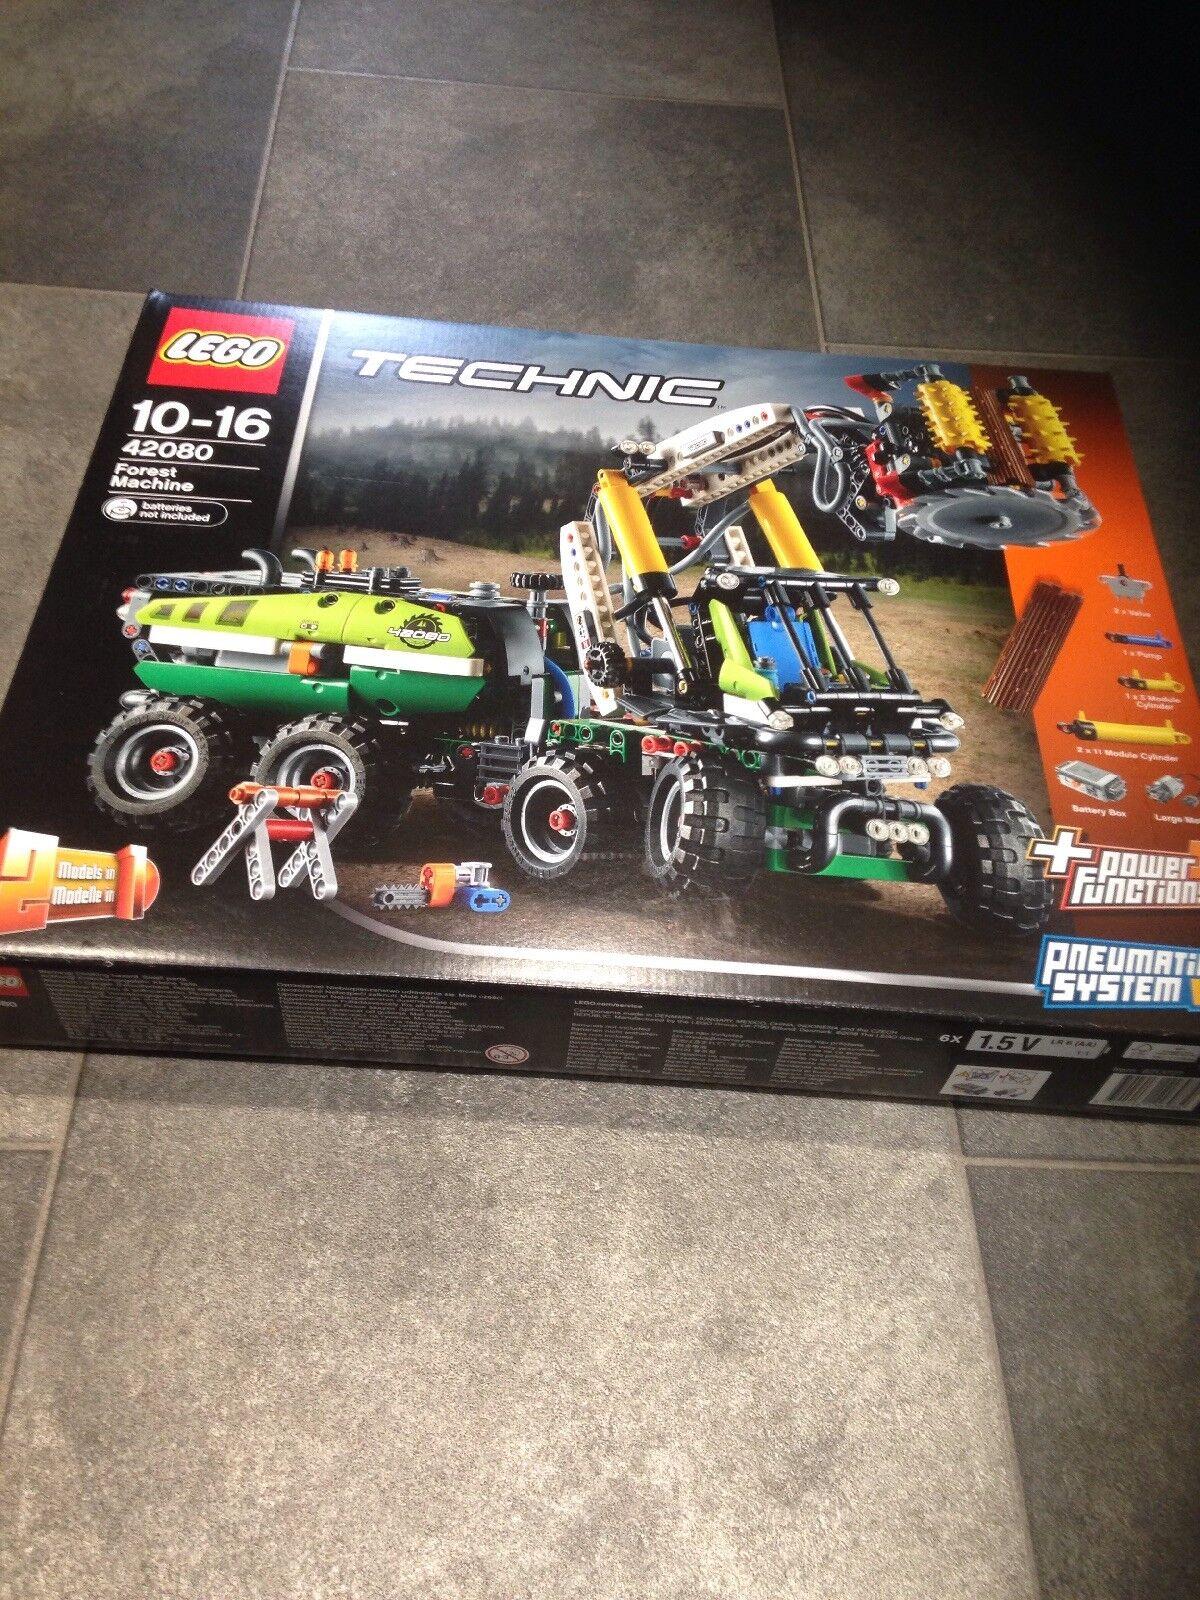 Lego 42080 Technic Bosque máquina Carretilla Elevadora Camión de juguete, 2 en 1 Fun Modelo, Alimentación..